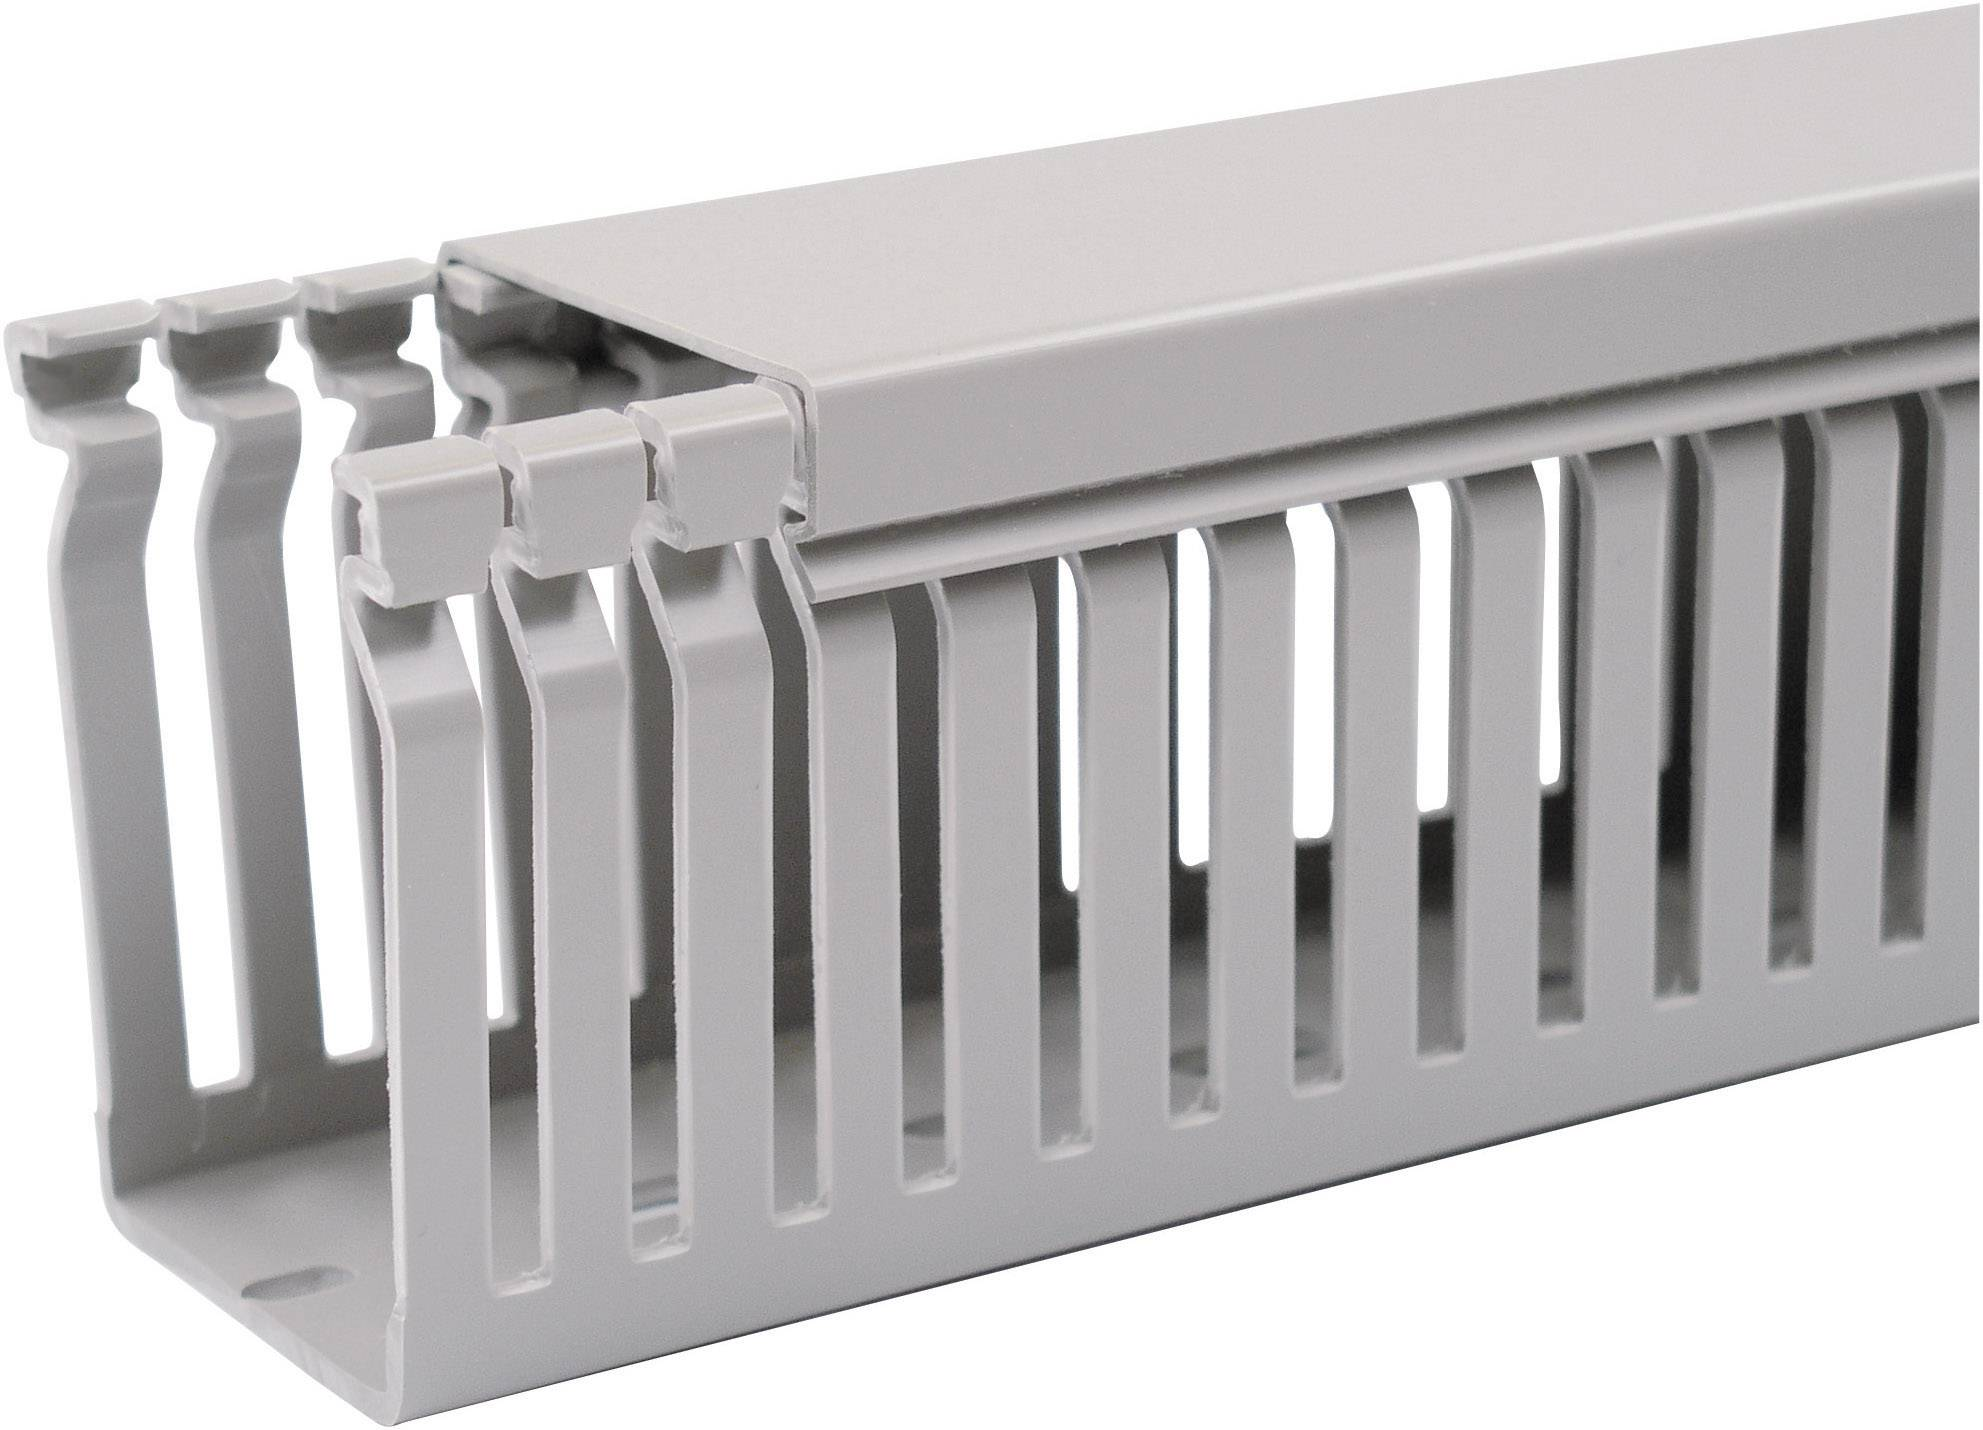 Elektroinstalační lišta OBO Bettermann, 6178033, 60x60 mm, 2 m, šedá